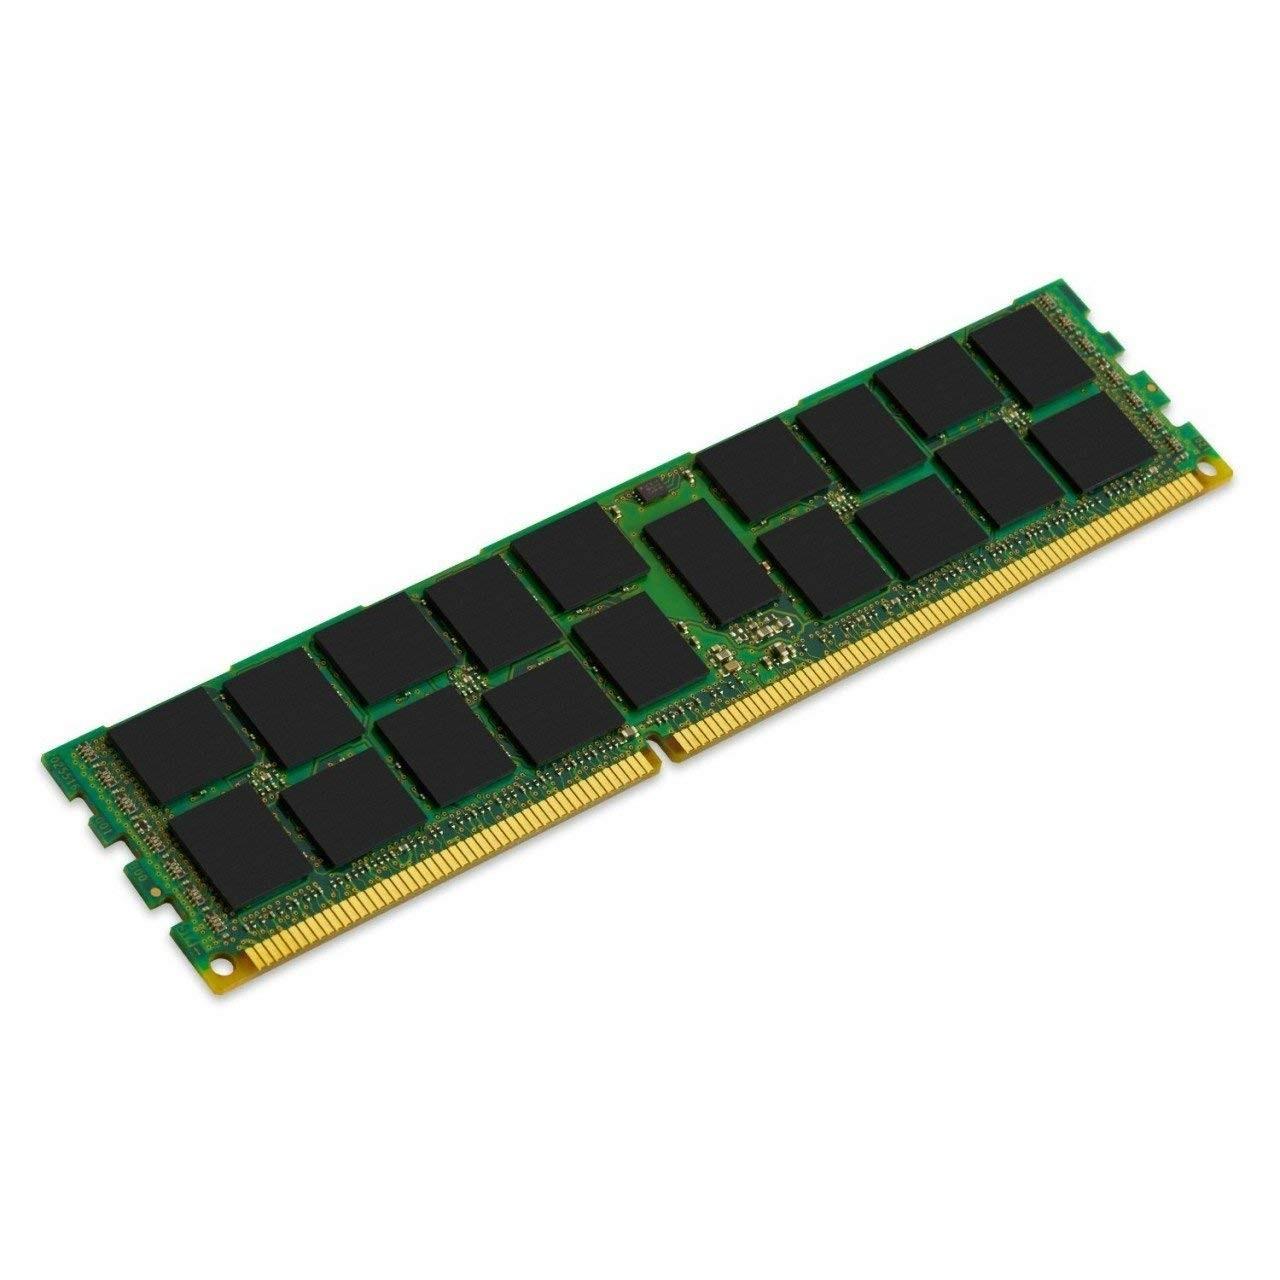 HPE 815101-B21 64GB PC4-21300 LRDIMM-2666MHz ECC Registered Image